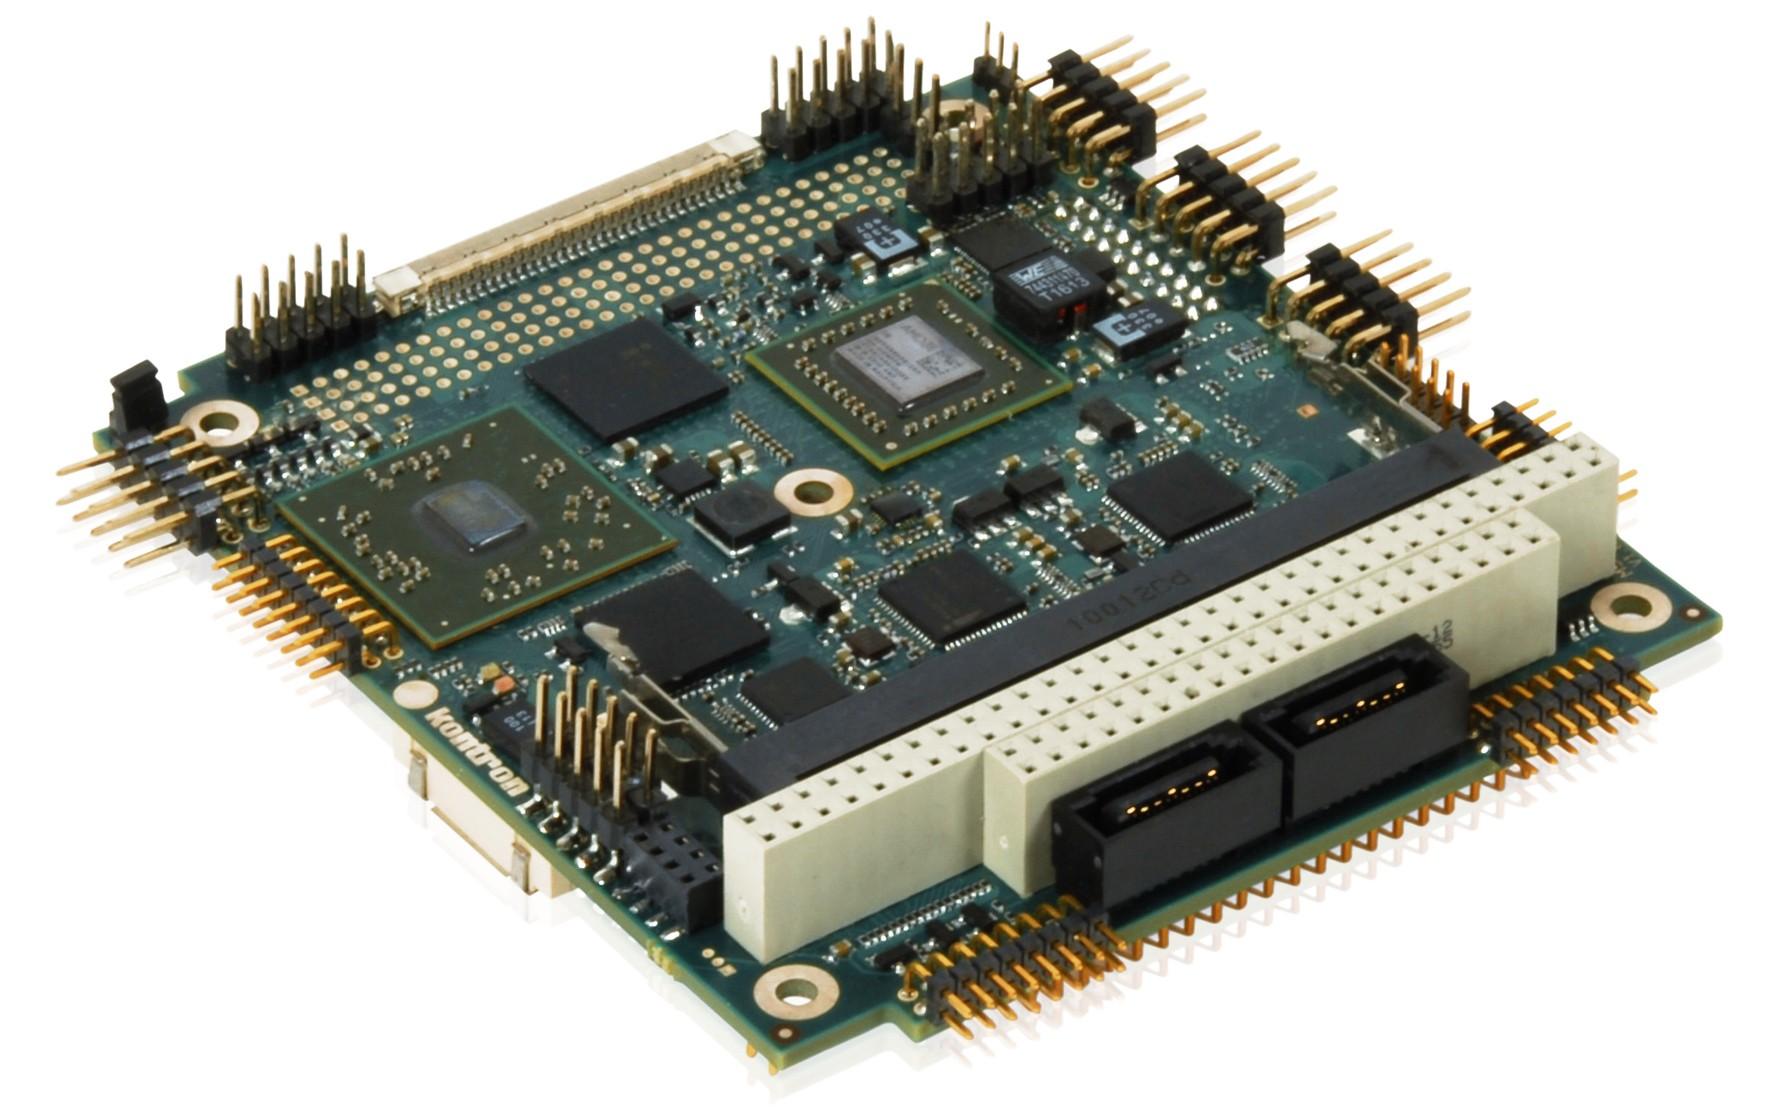 5b1254b14b La familia de Cpus PC 104 (PC 104